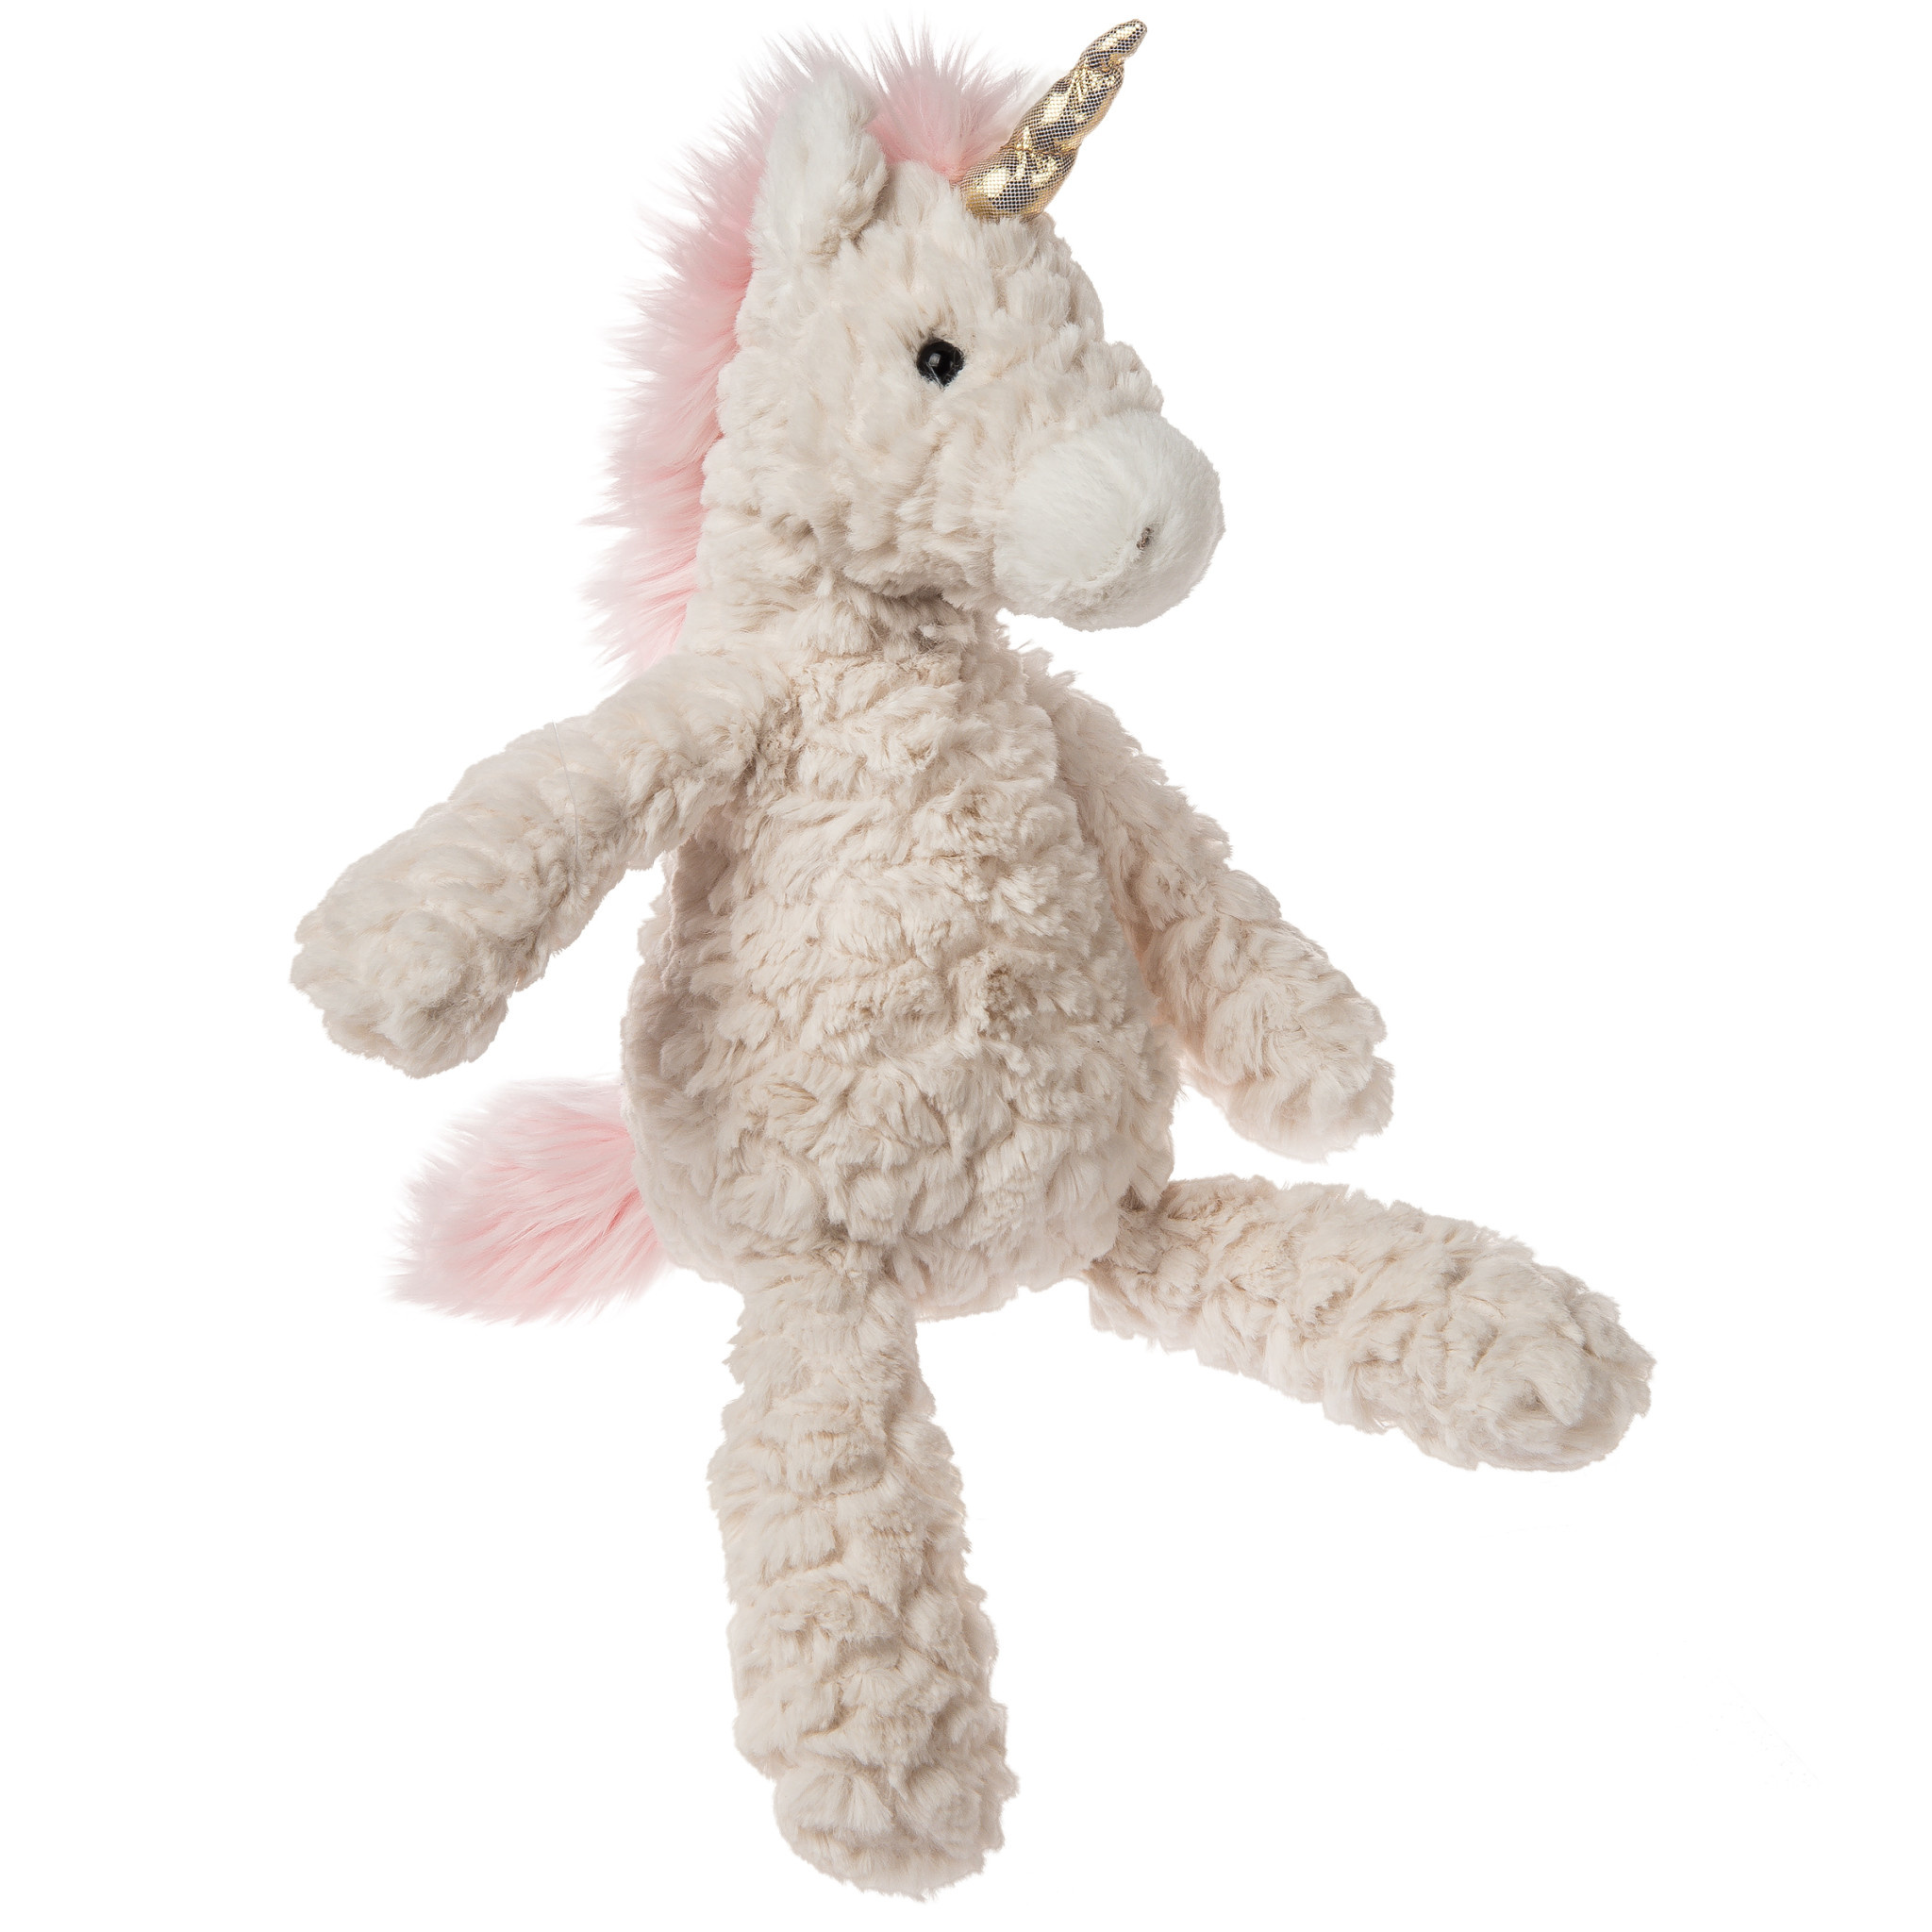 Mary Meyer Cream Putty Unicorn - Large